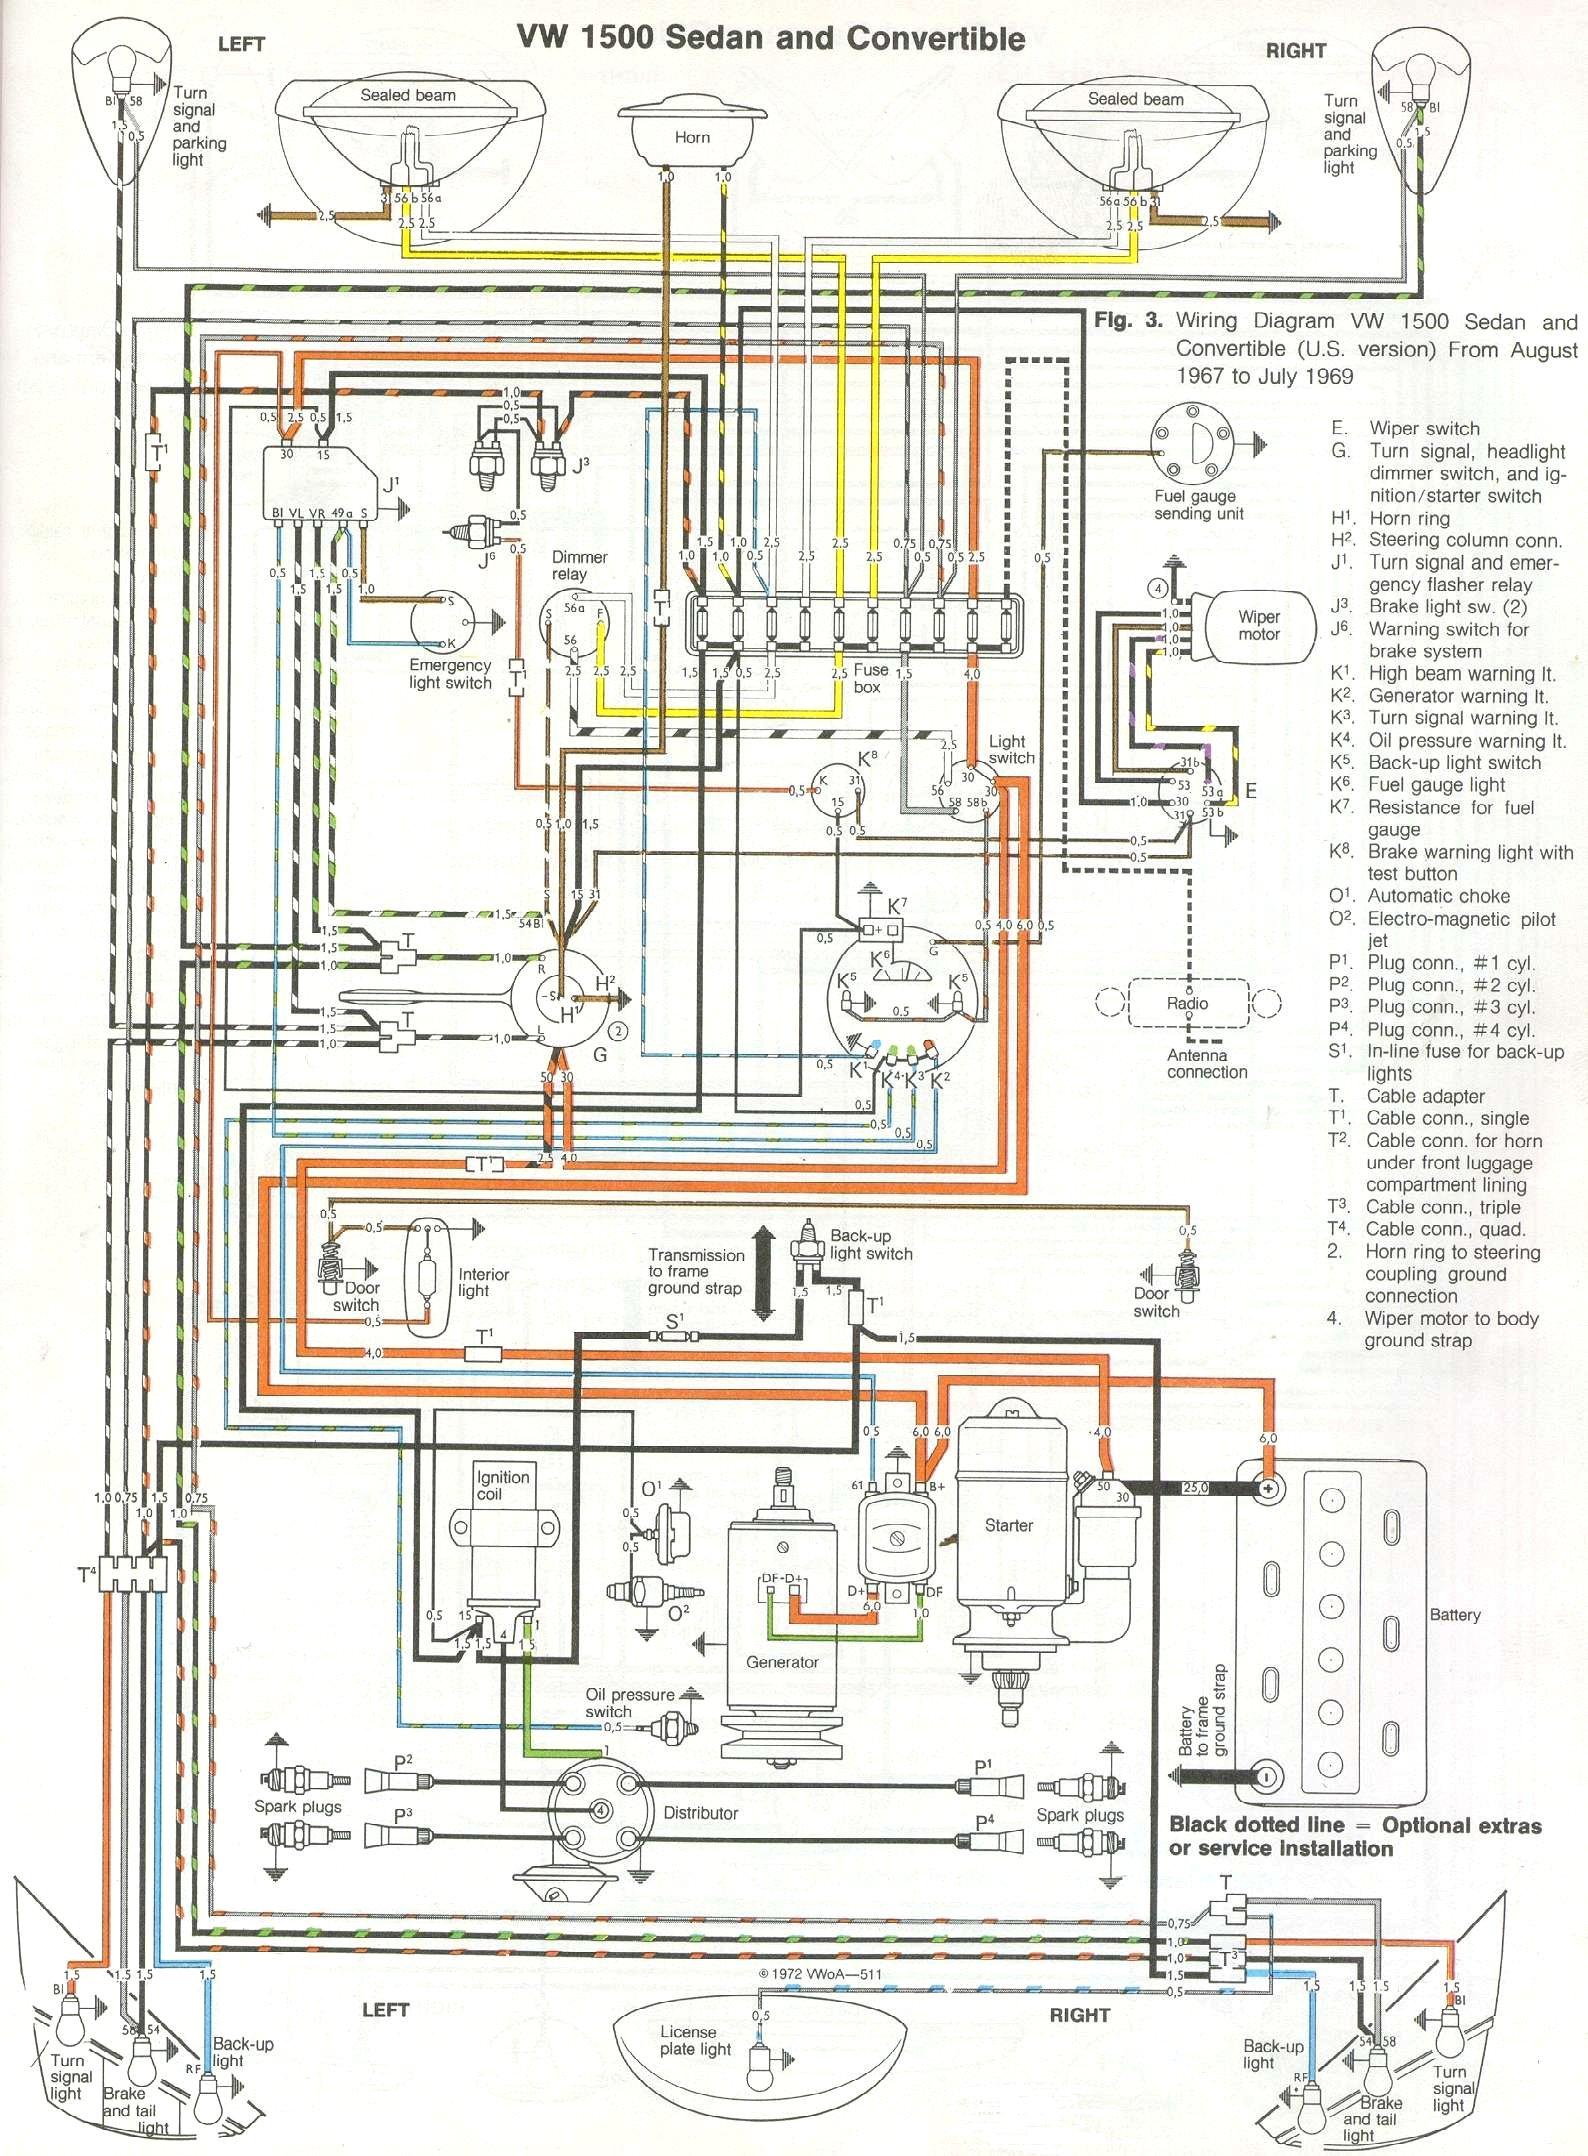 1969 71 Beetle Wiring Diagram TheGoldenBug Com